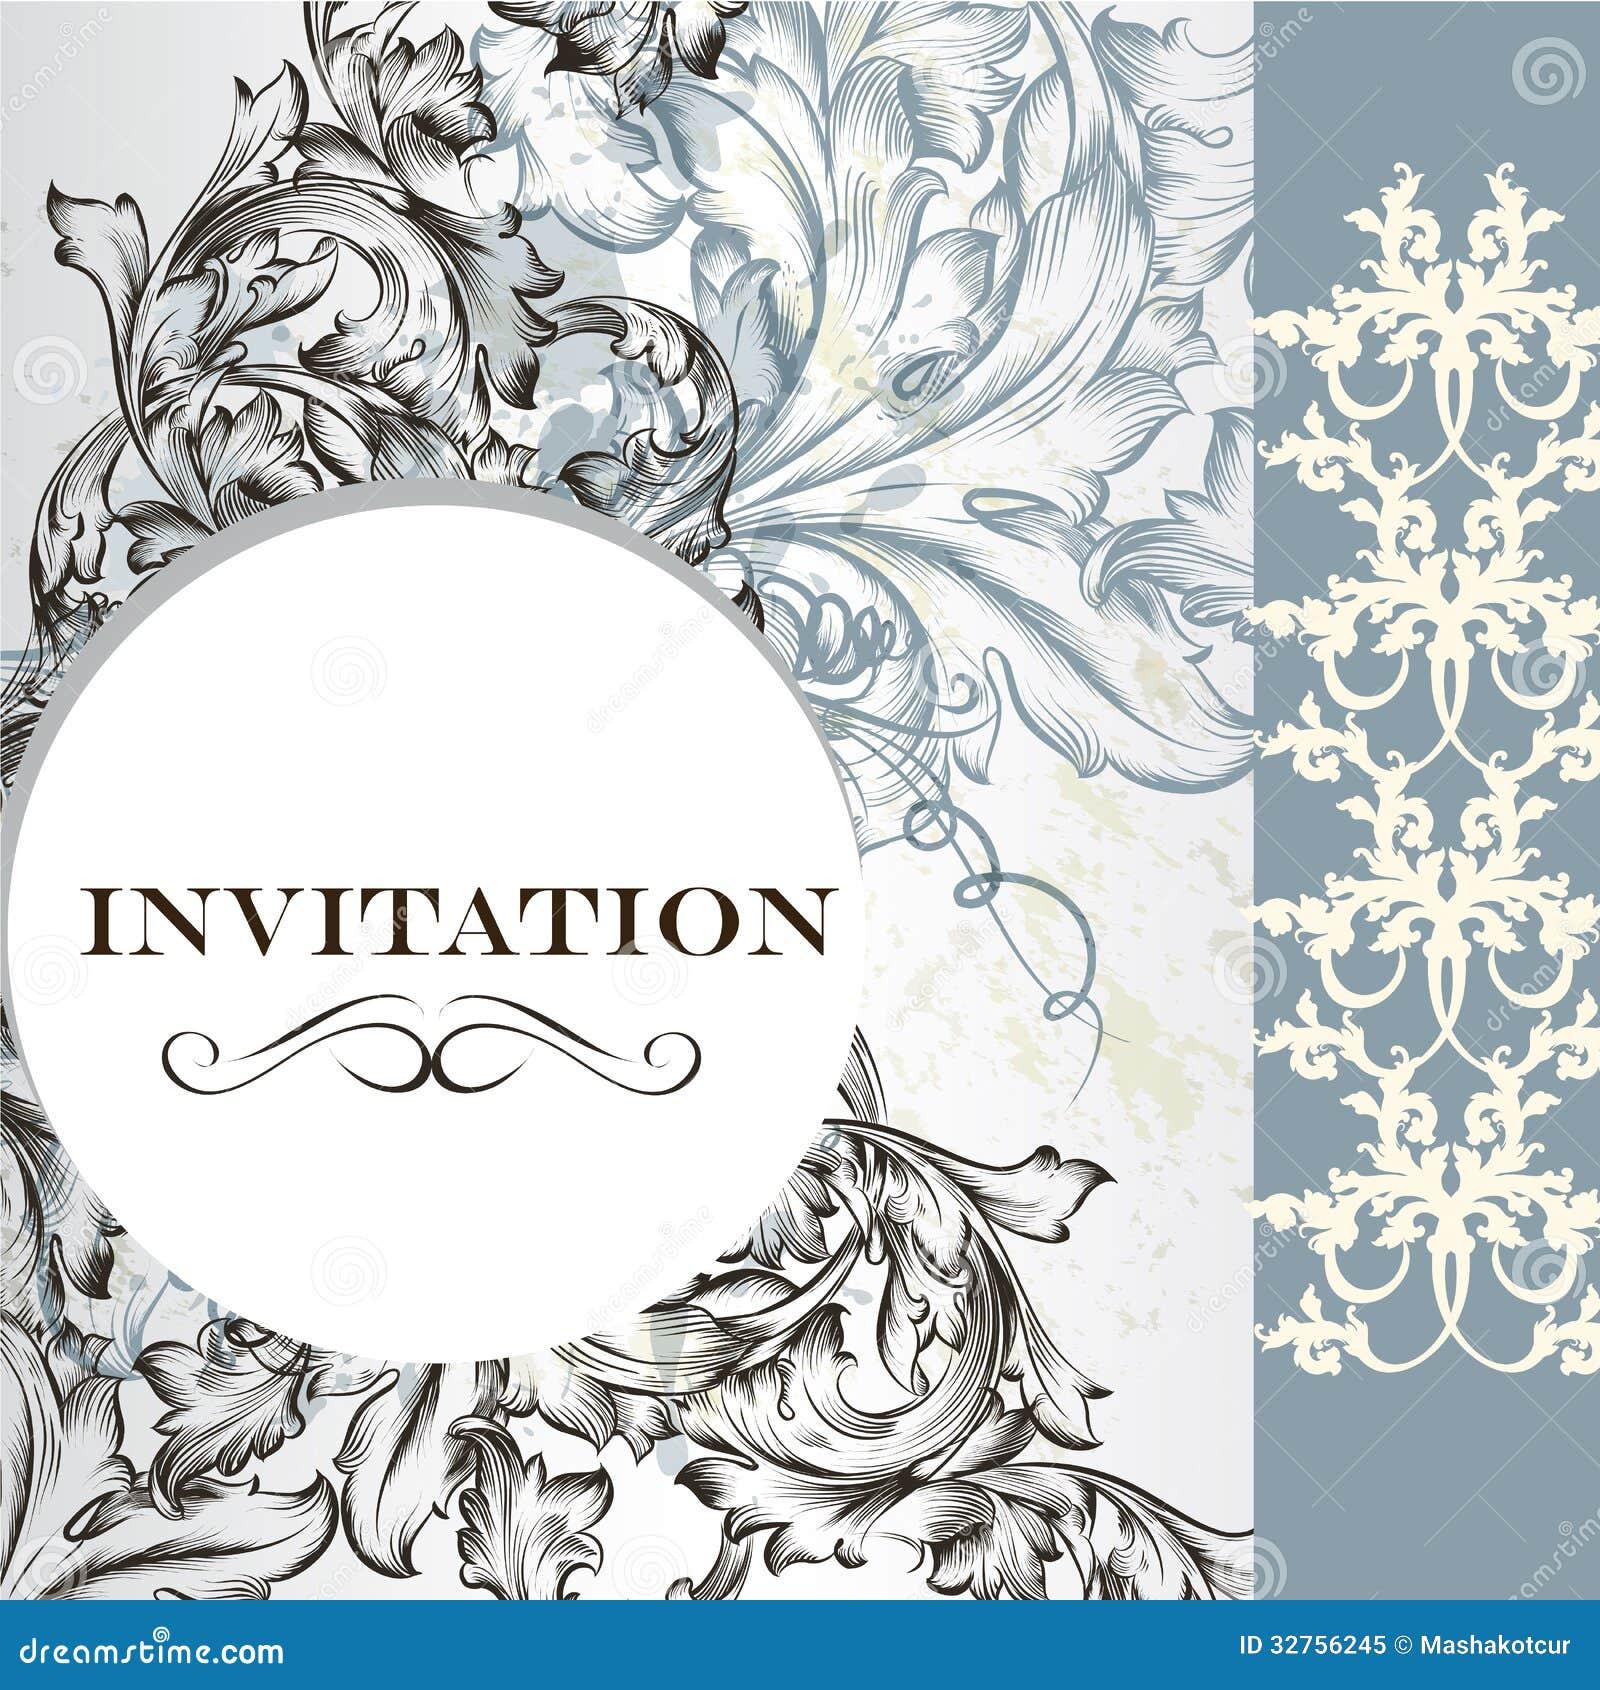 Elegant invitation card in vintage style stock vector illustration royalty free stock photo stopboris Choice Image